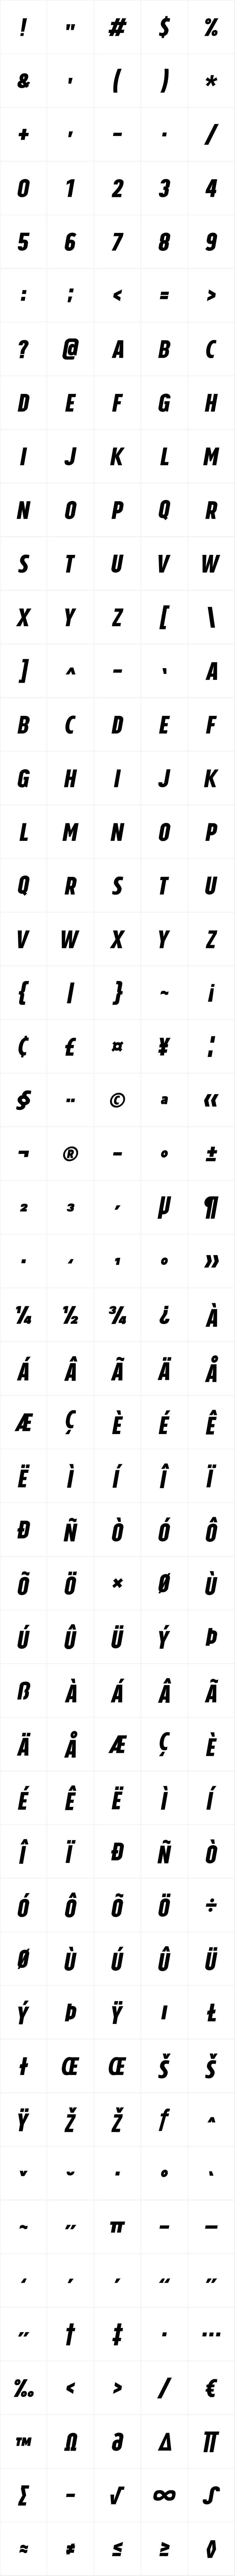 Tolyer Bold no3 Oblique